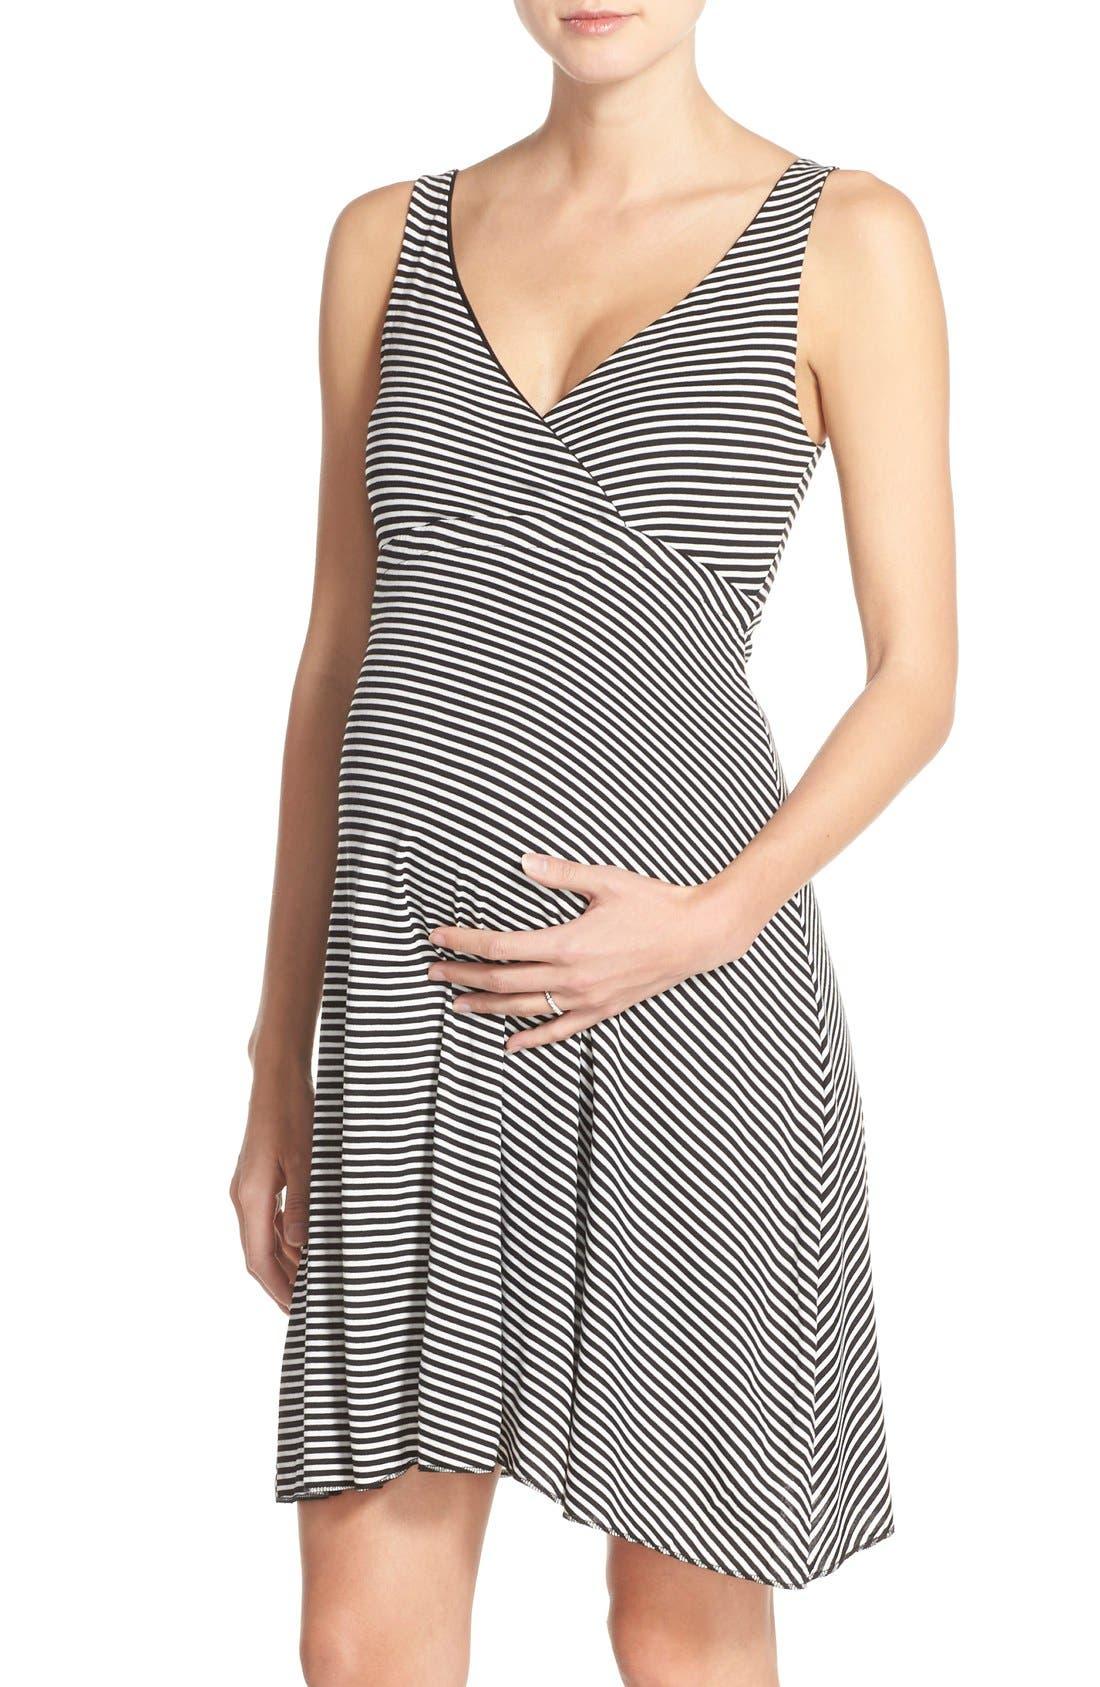 Reversible Nursing Dress,                         Main,                         color, 001